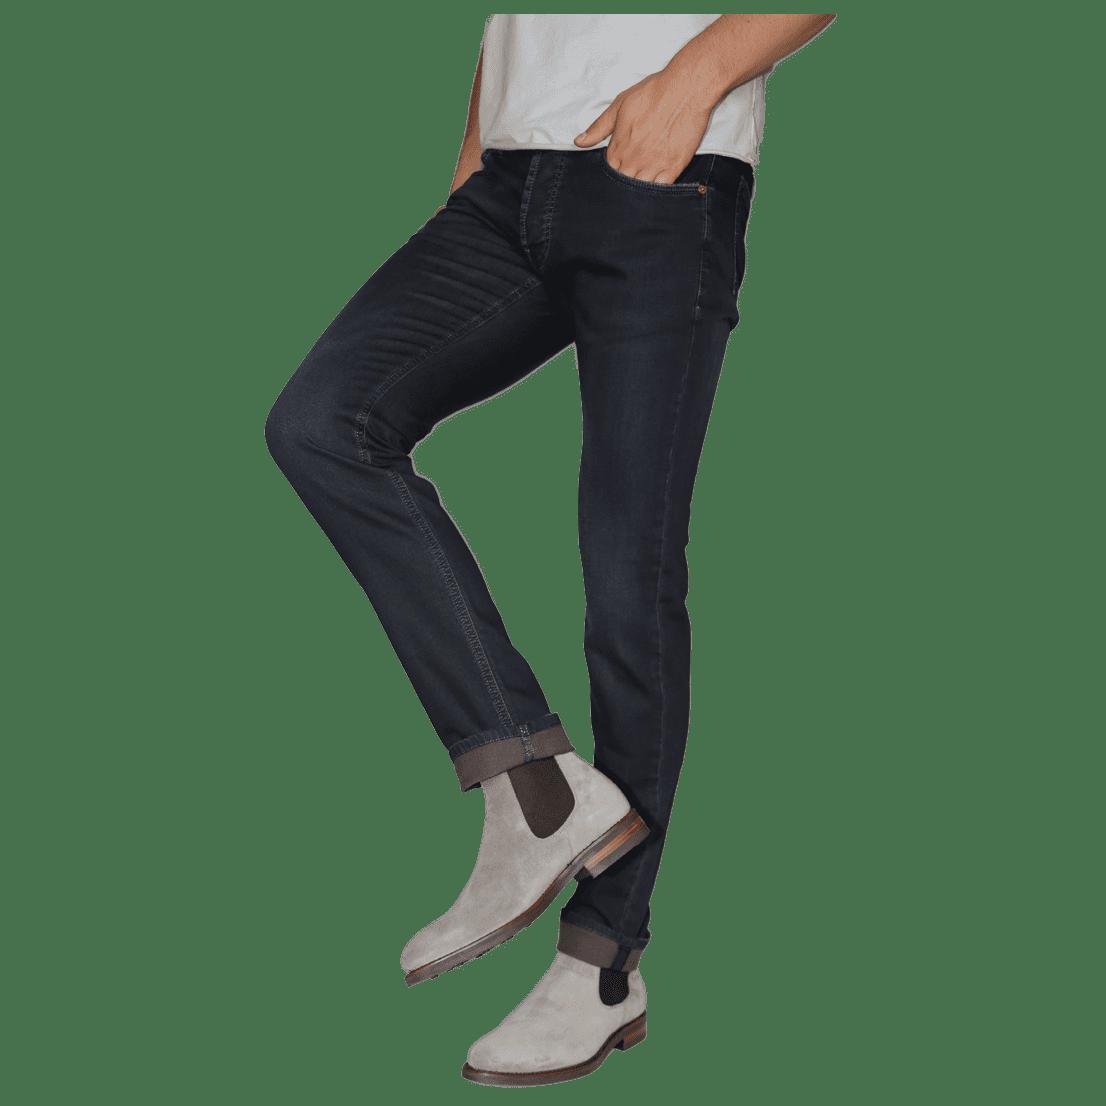 Cabinero Stiles Berlin PG Enjoy Jeans, Herrenhosen, made in Italy AW17-18 denim Blue-Brown